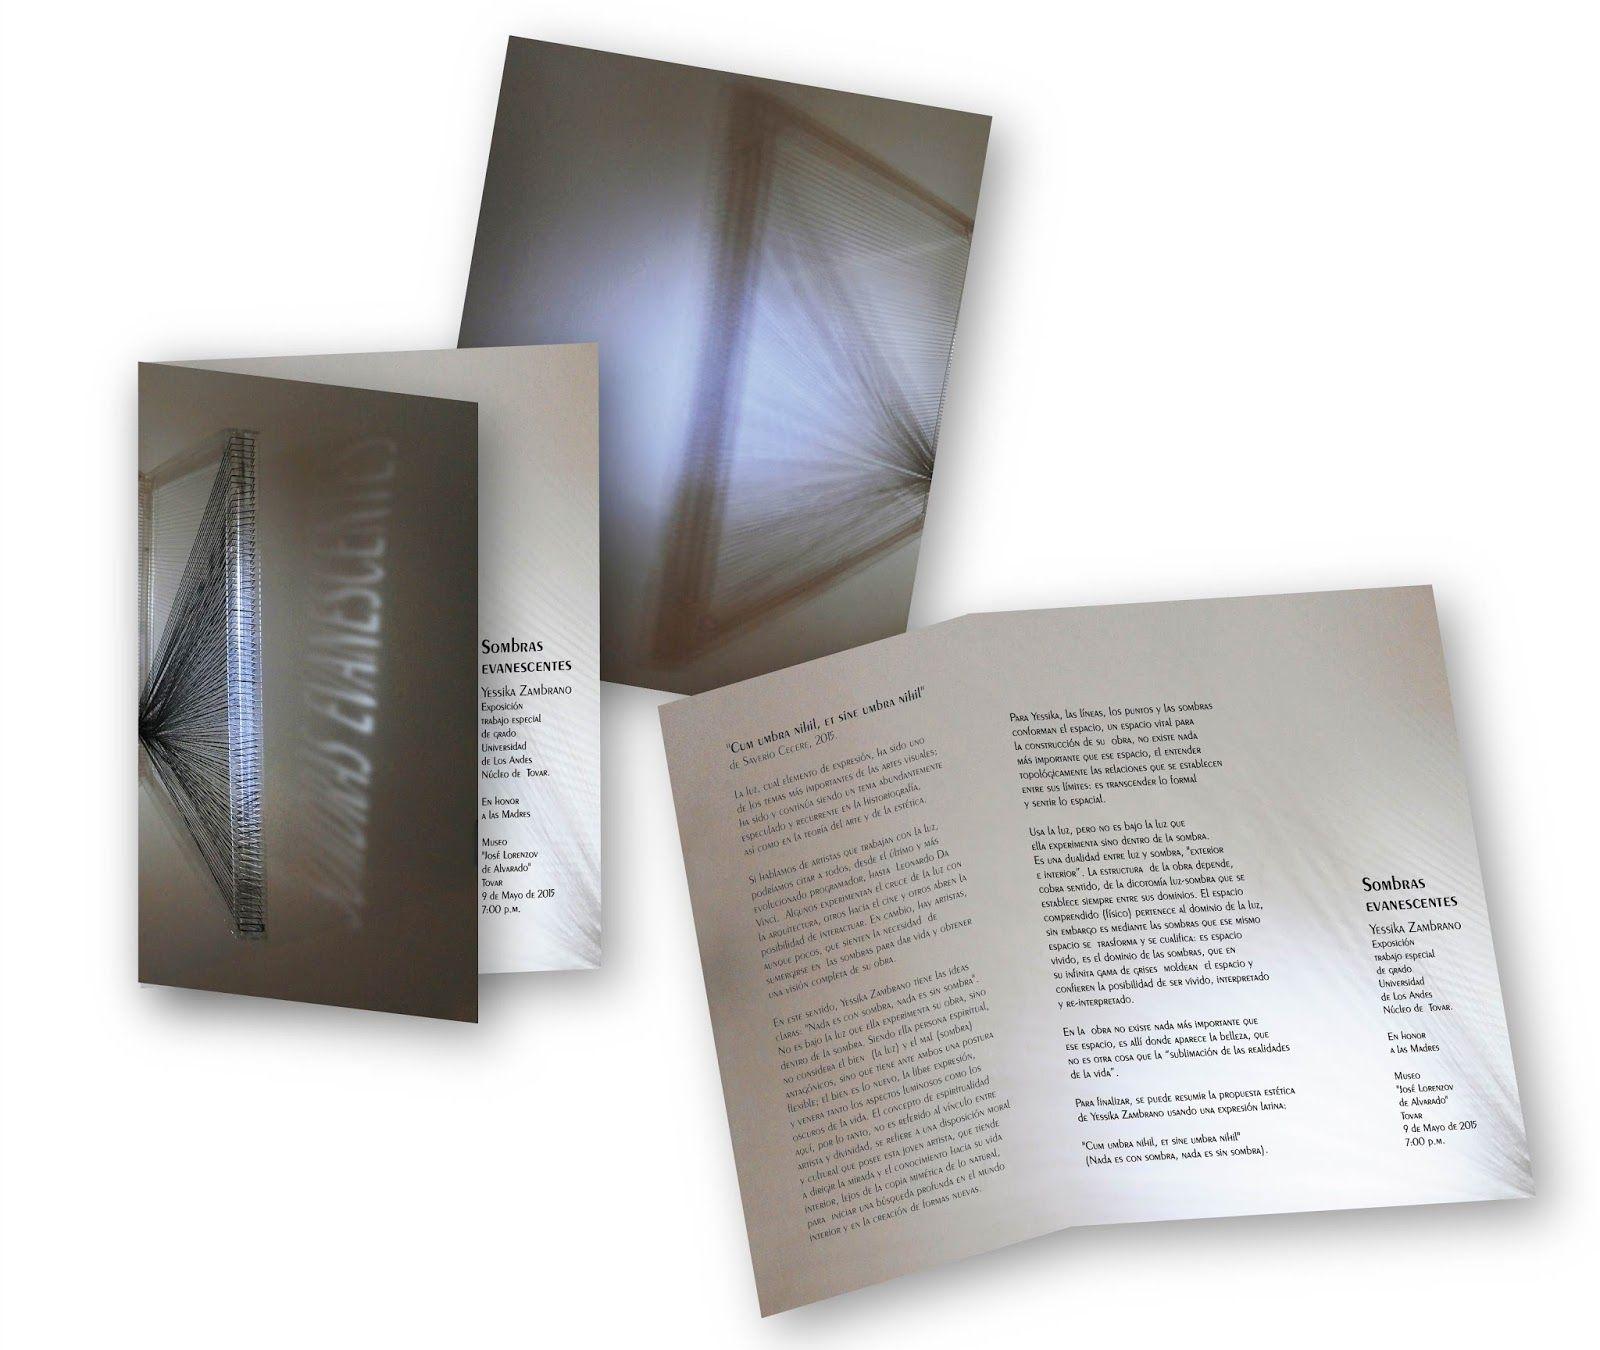 Catálogo de la exposición Sombras evanescentes  diseñado por Gracia Chacón Ocaris